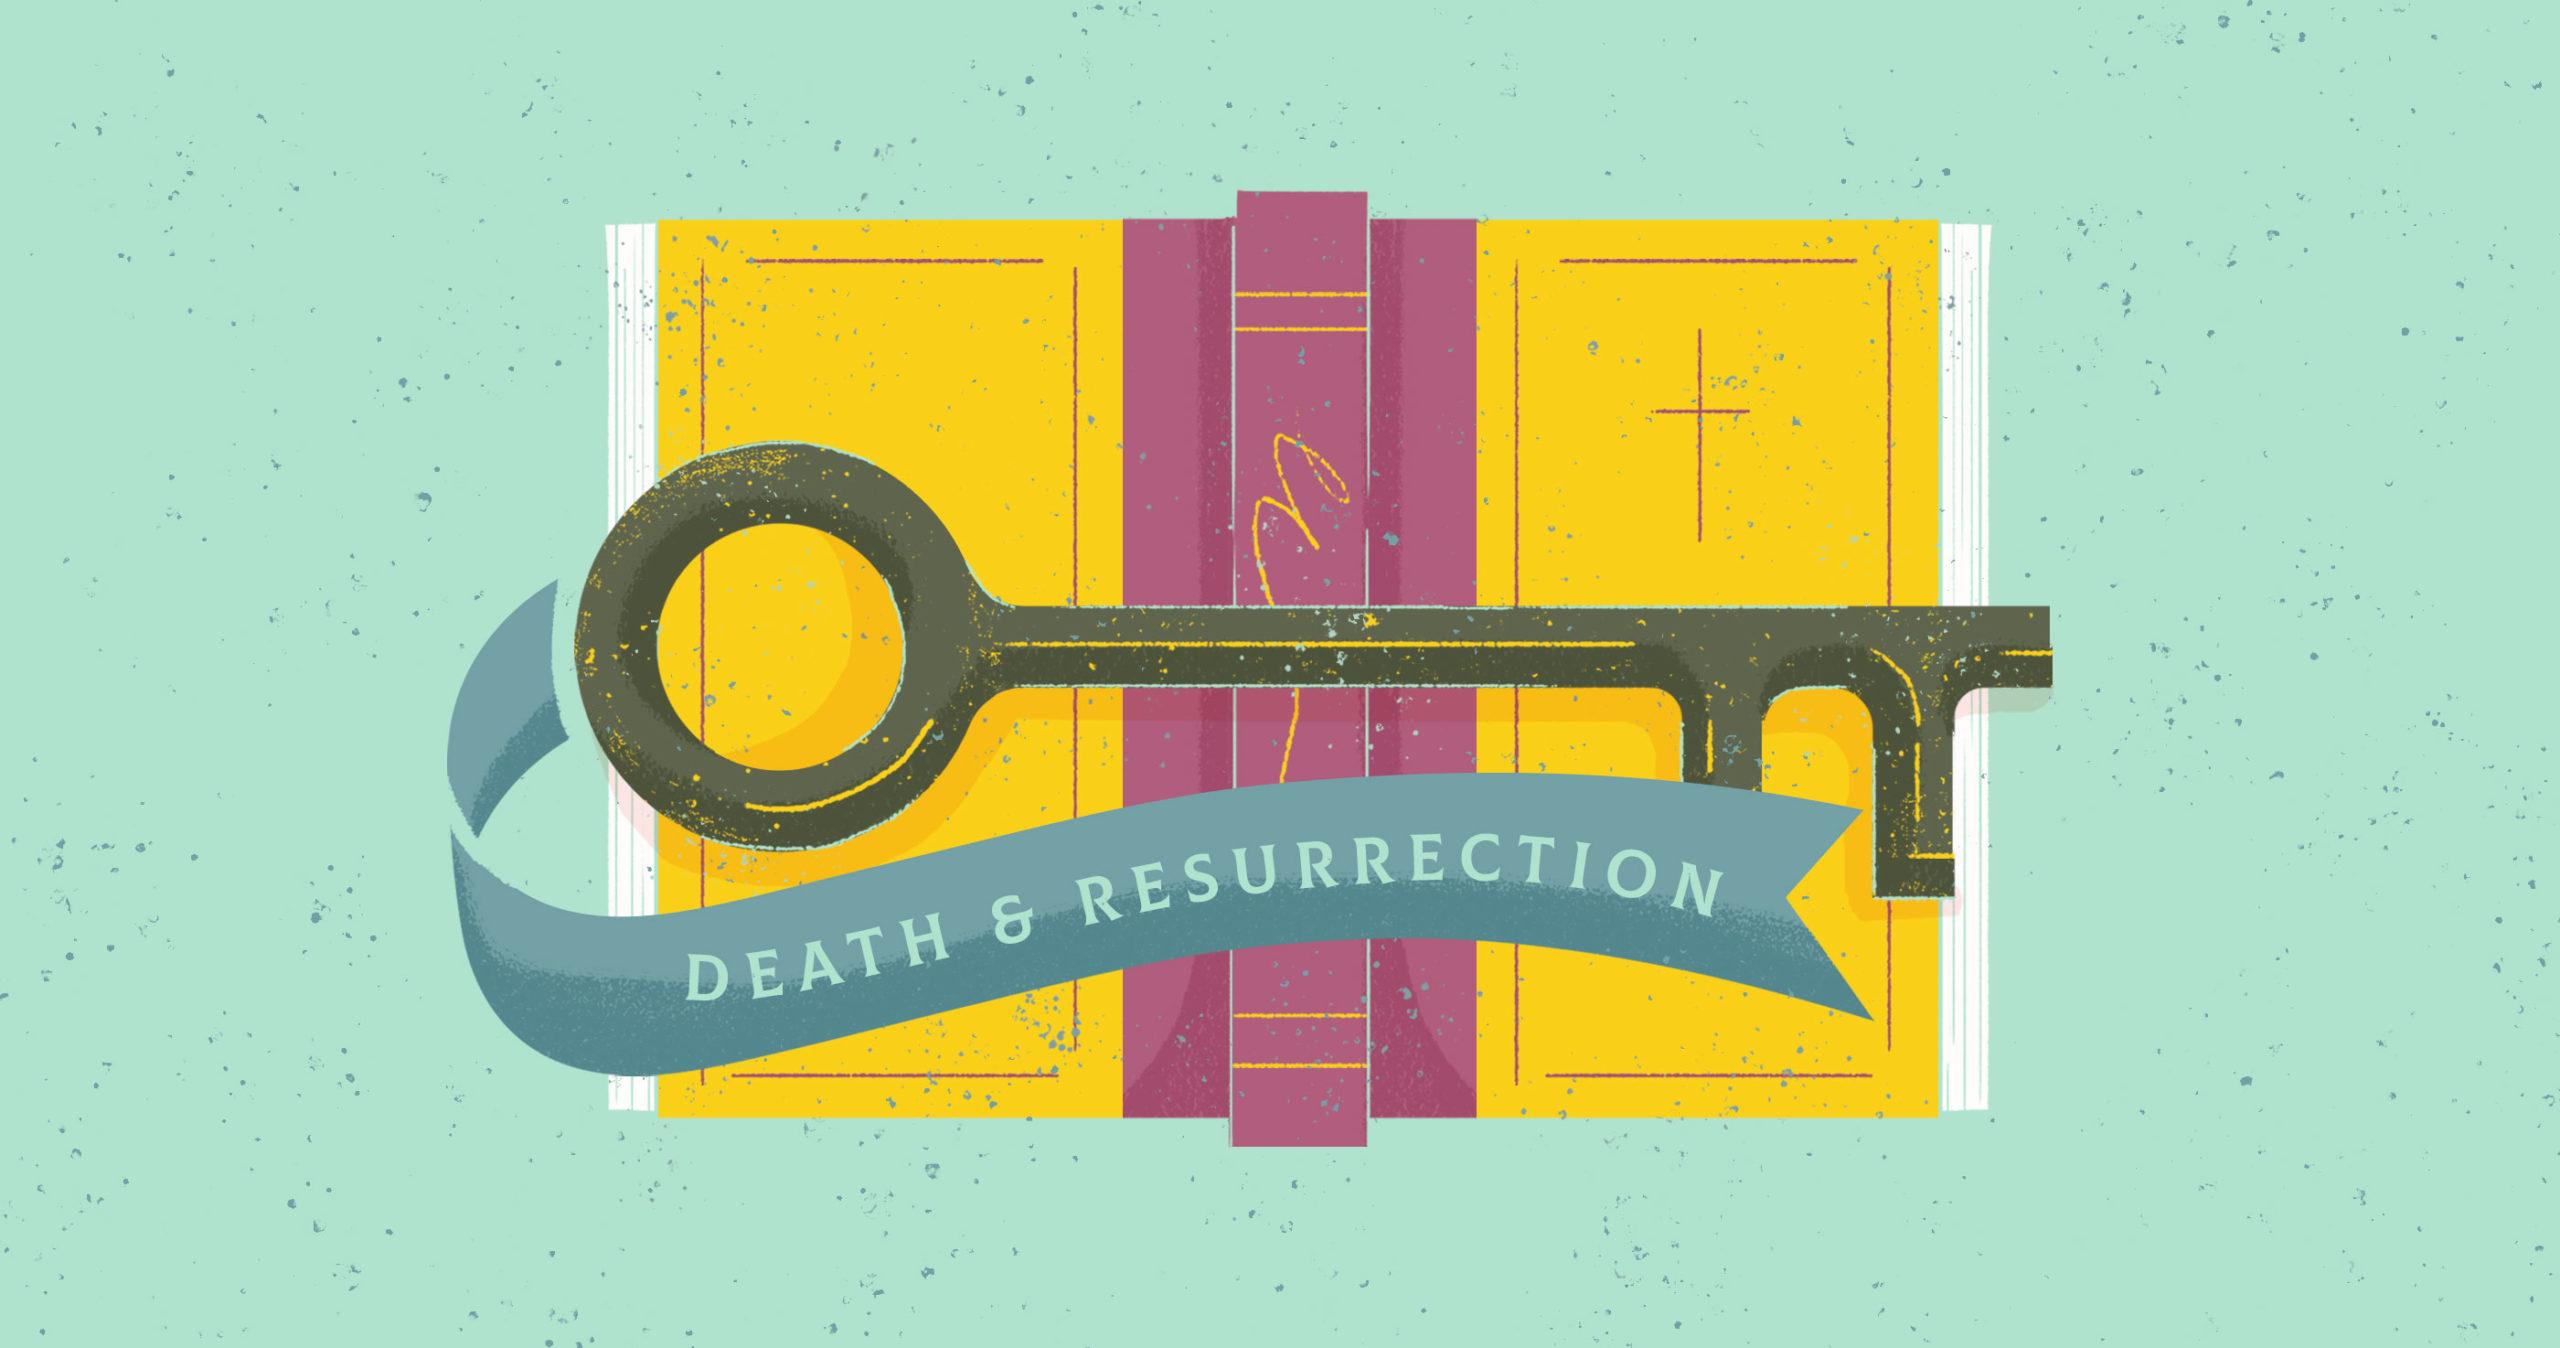 Vargje kyce biblike per vdekjen dhe ringjalljen (vdekja & ringjallja)